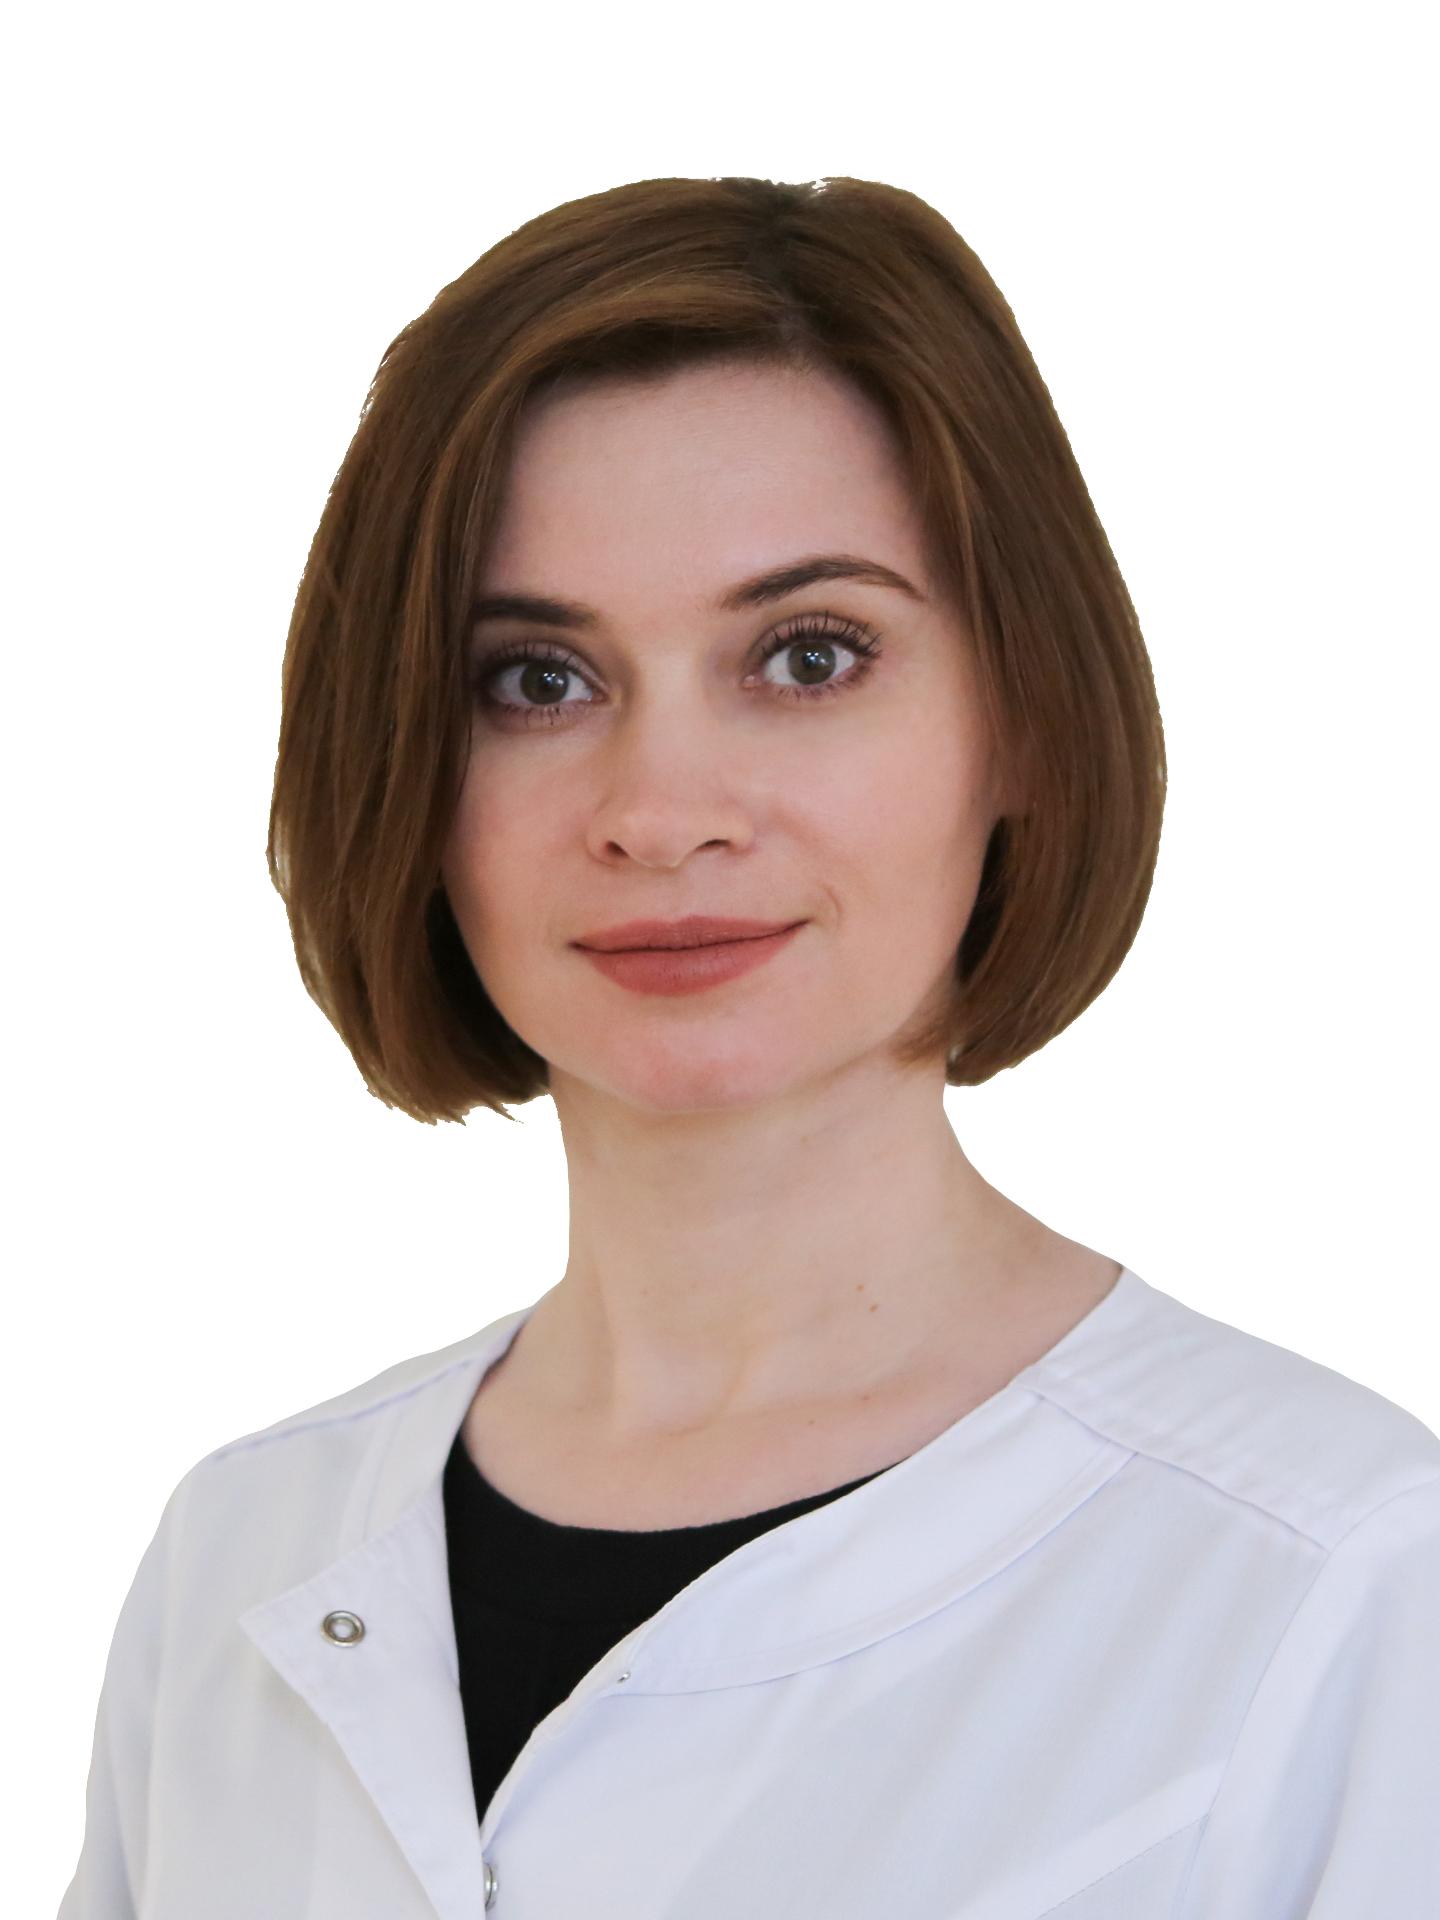 Егоренкова Ольга Сергеевна